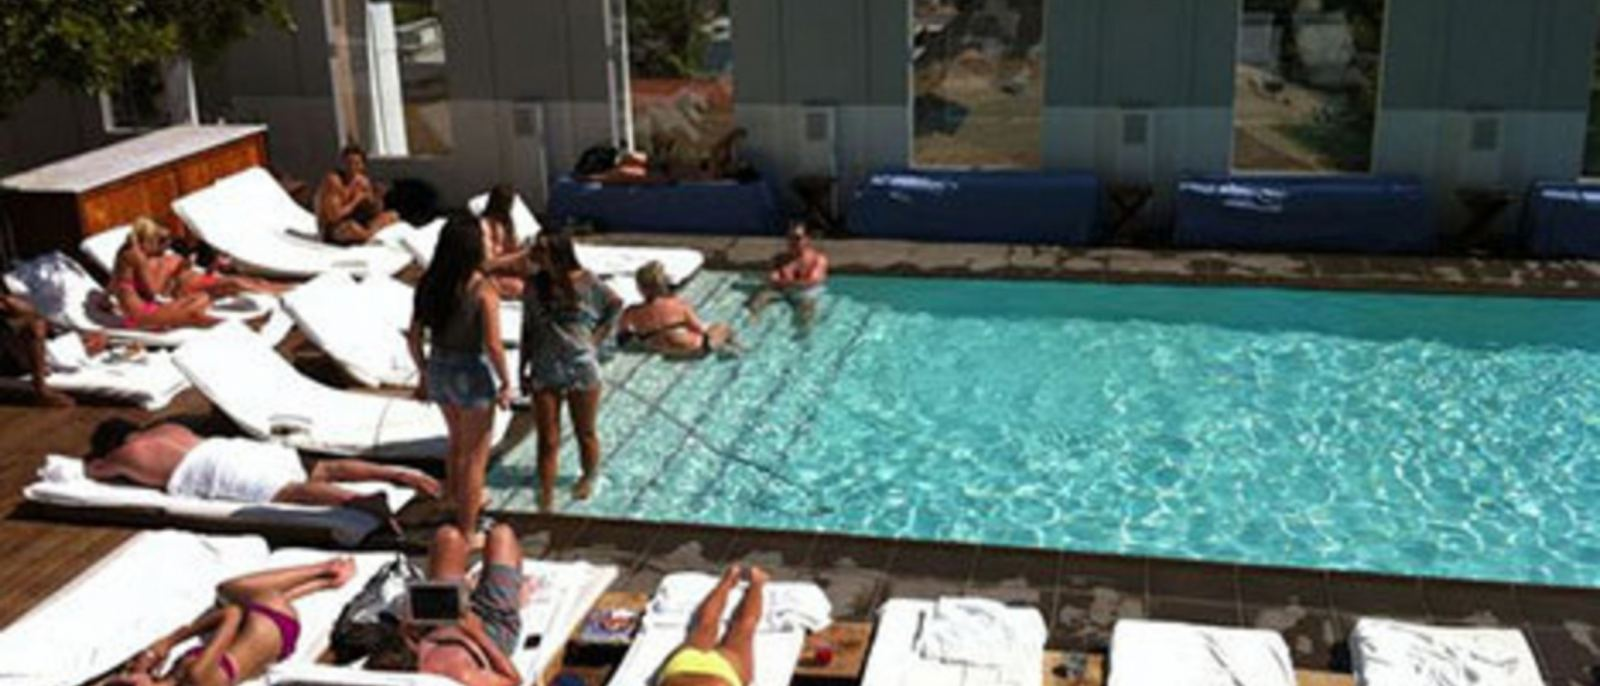 Sjybar pool